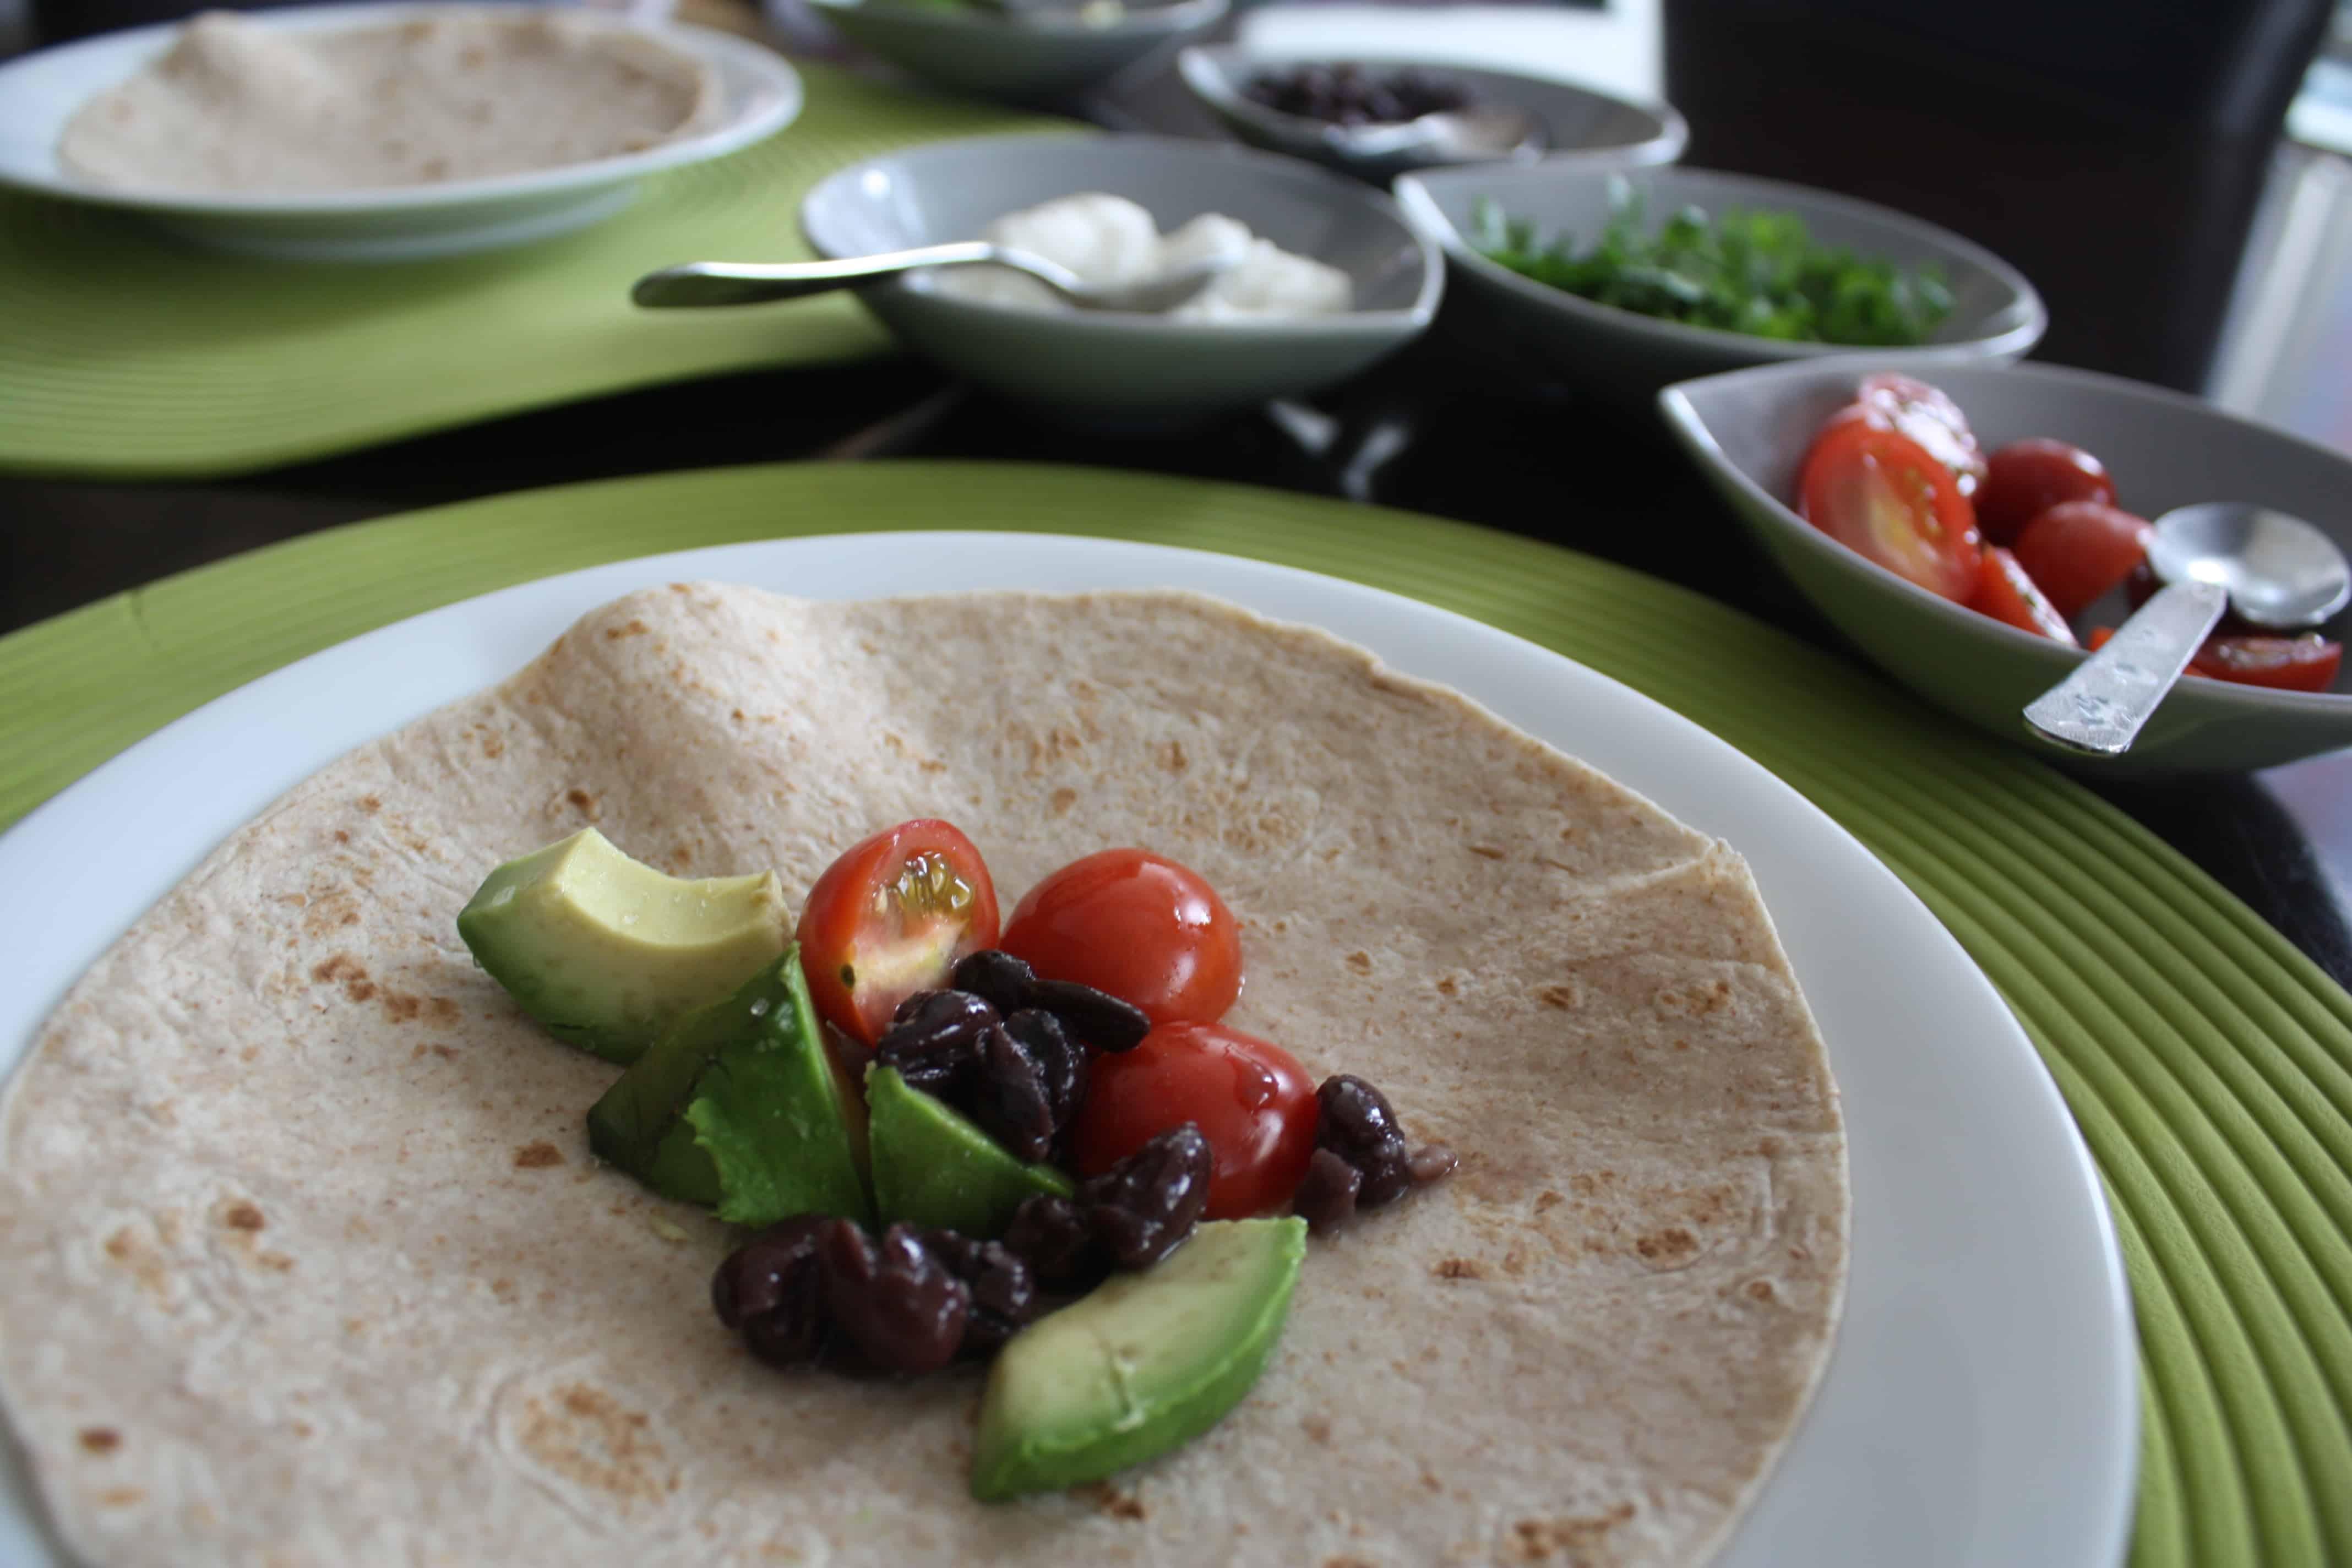 Afterschool snack – the healthy way